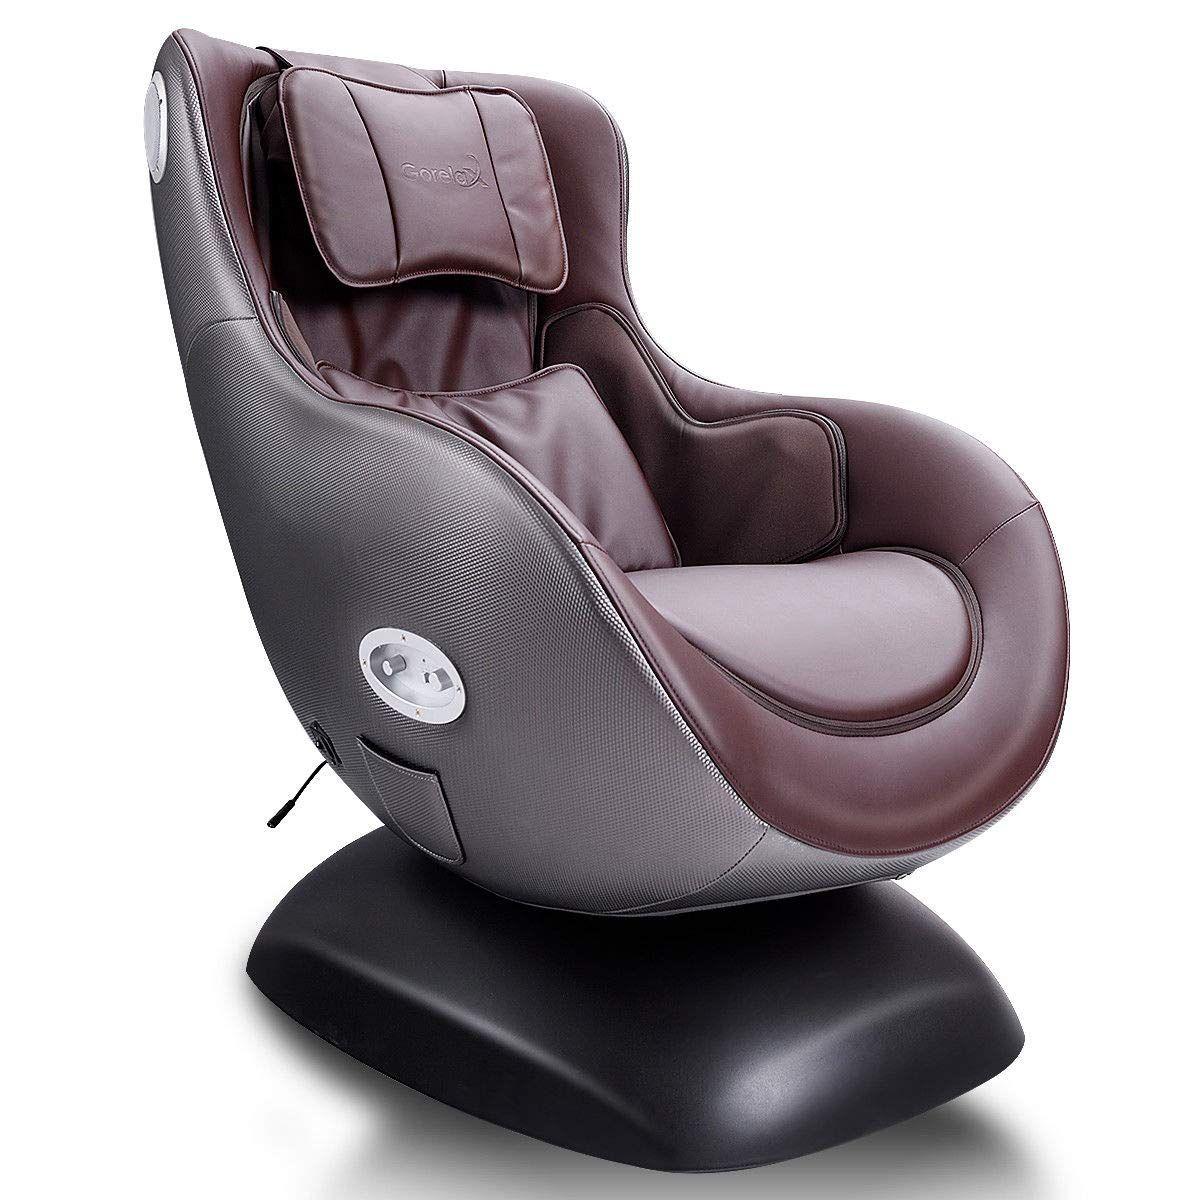 Giantex Leisure Curved Massage Chair Shiatsu Massage with